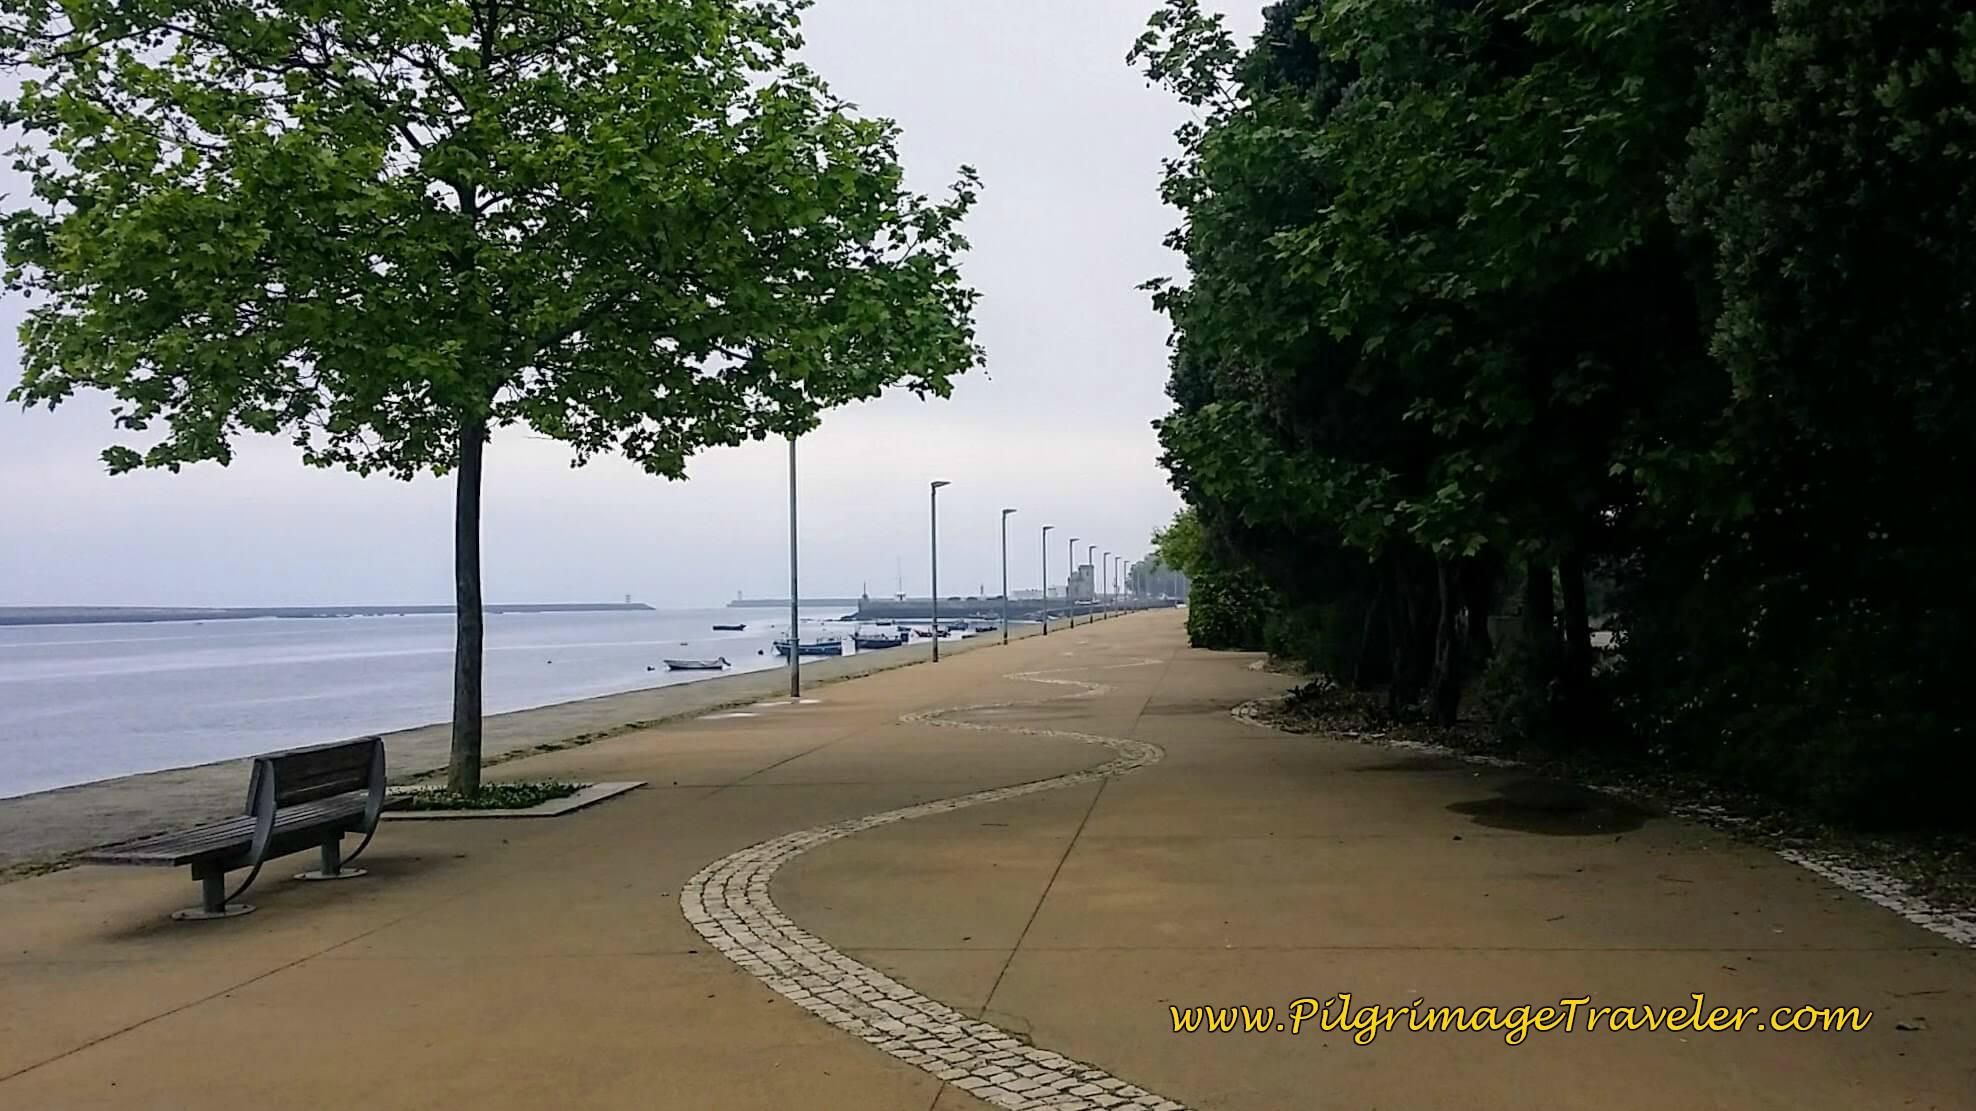 Rua do Passeio Alegre - The Joyful Passageway on day fifteen of the Camino Portugués on the Senda Litoral